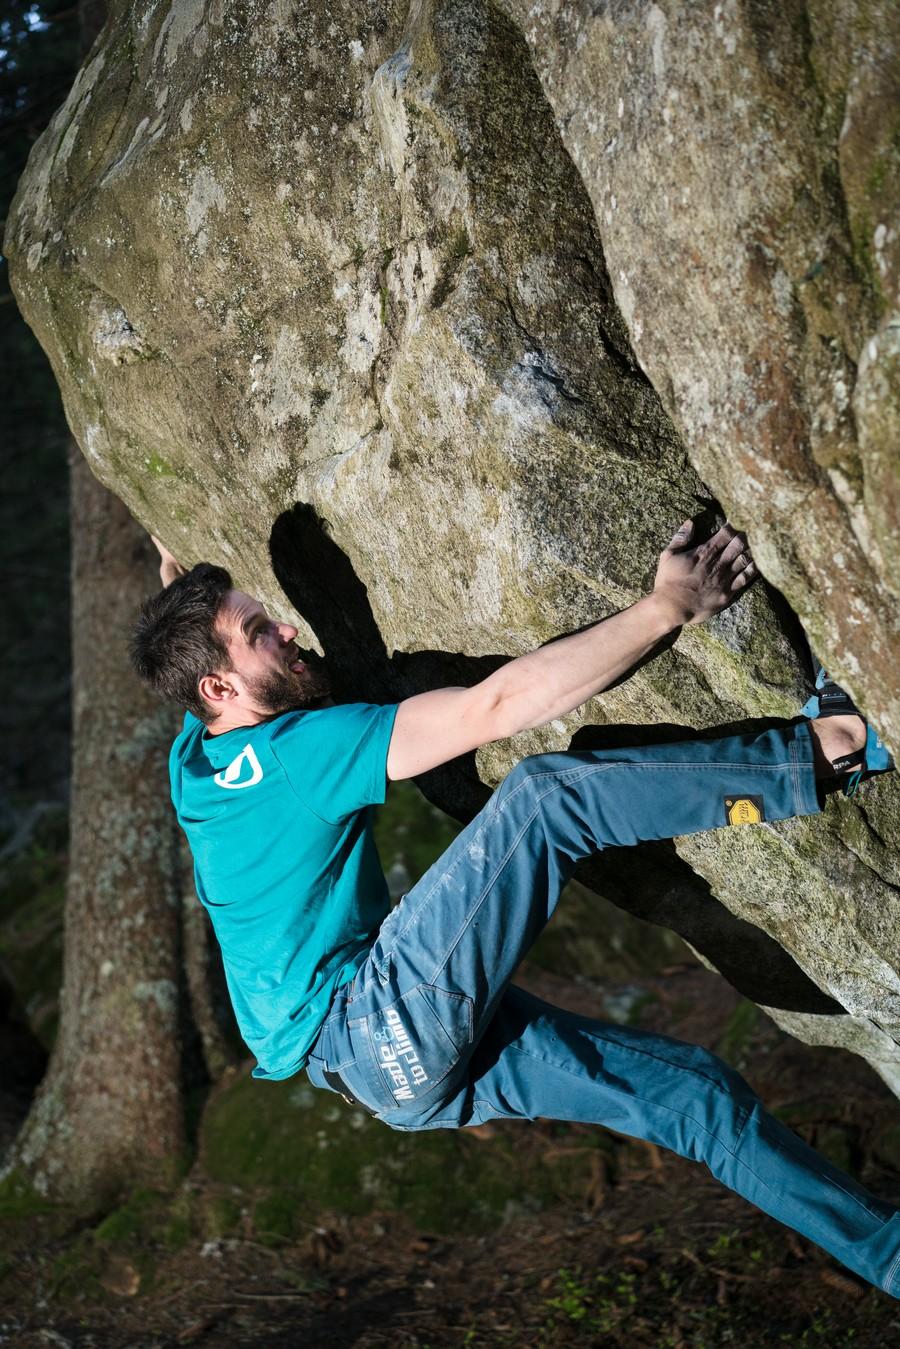 Climbing Team Vibram 2019